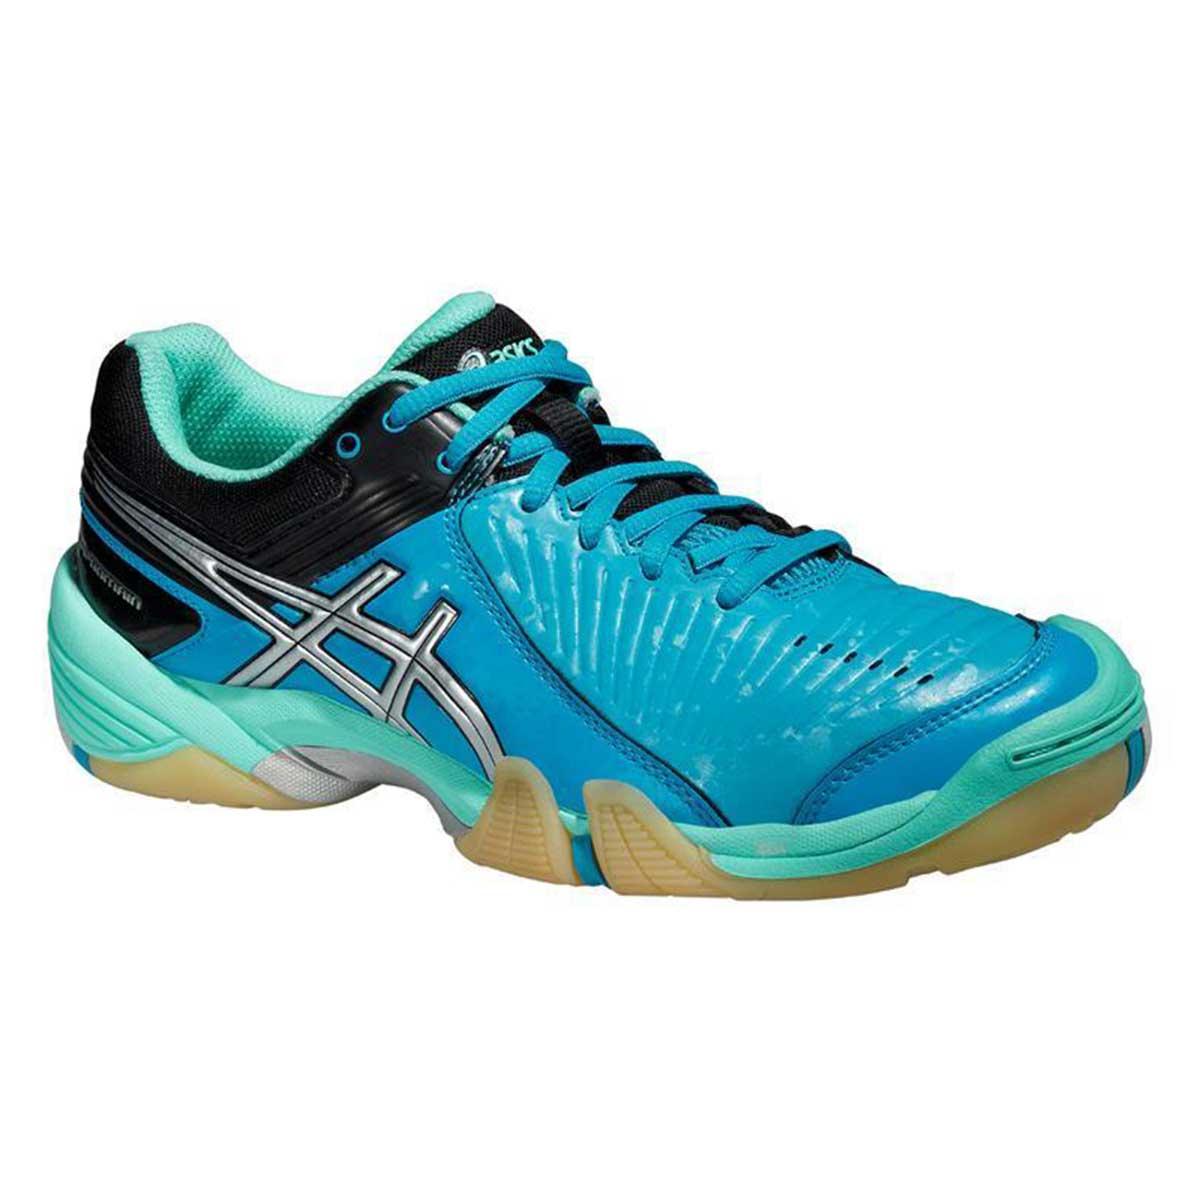 Squash Shoes, Squash, Sports, Buy, Asics, Asics Gel-Domain Women's Court  Shoes (Aqua Mint/Silver/Electric)